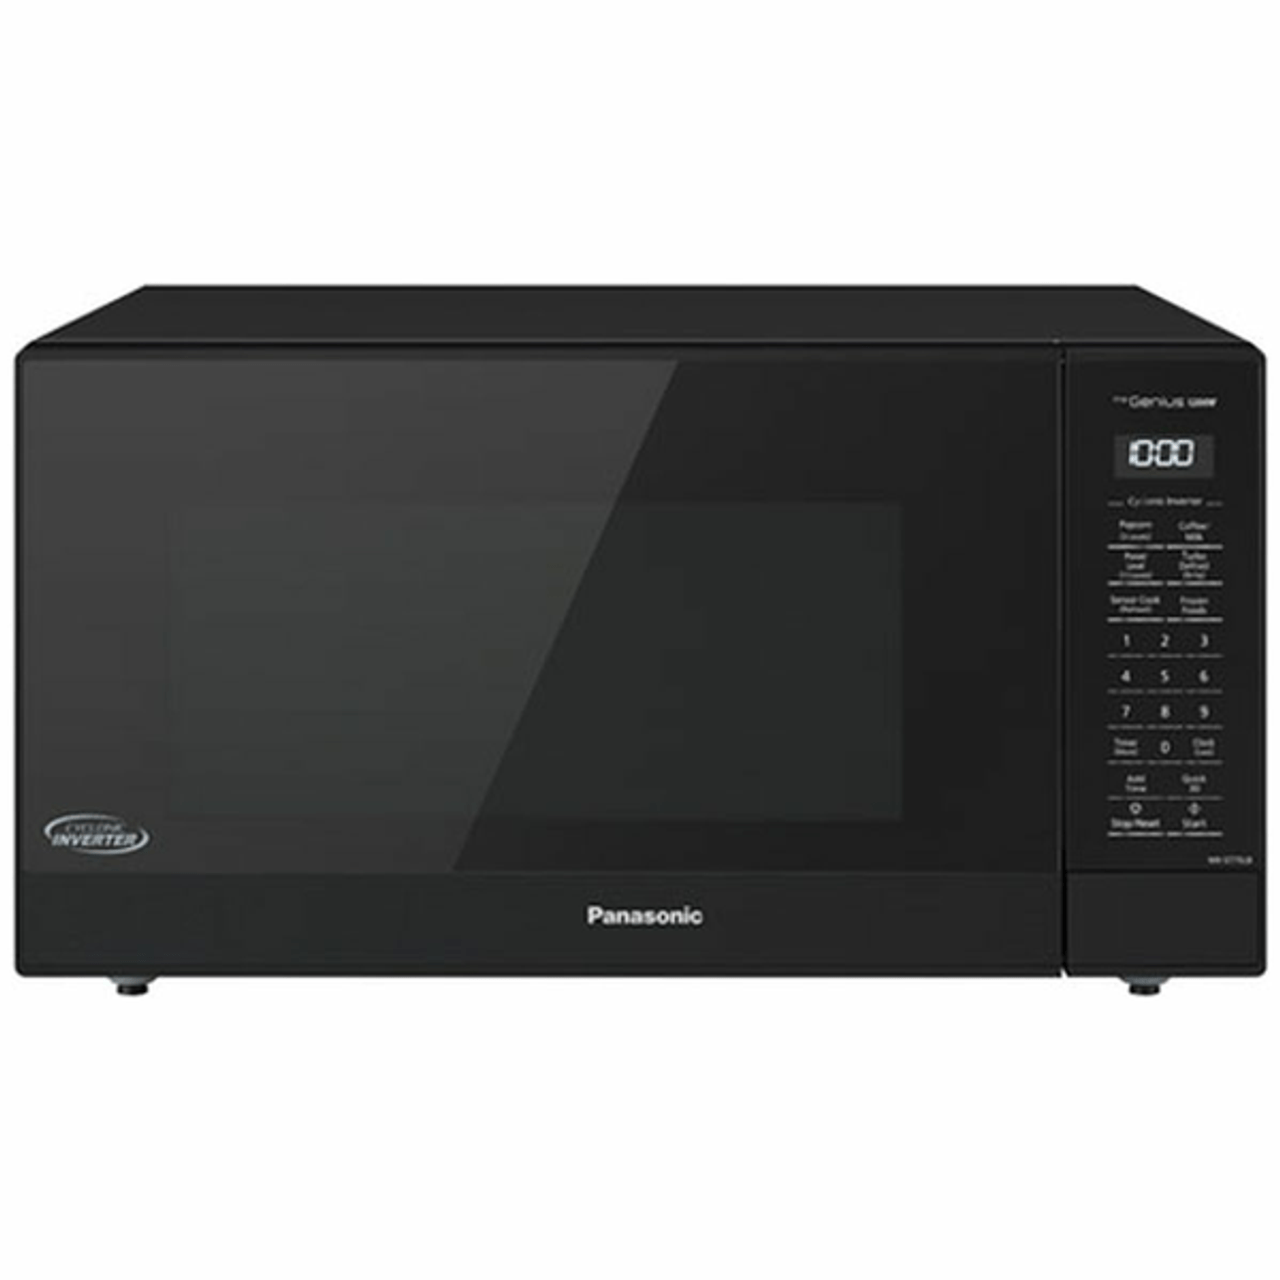 nnst75lbqpq 44l cyclone inverter microwave oven black